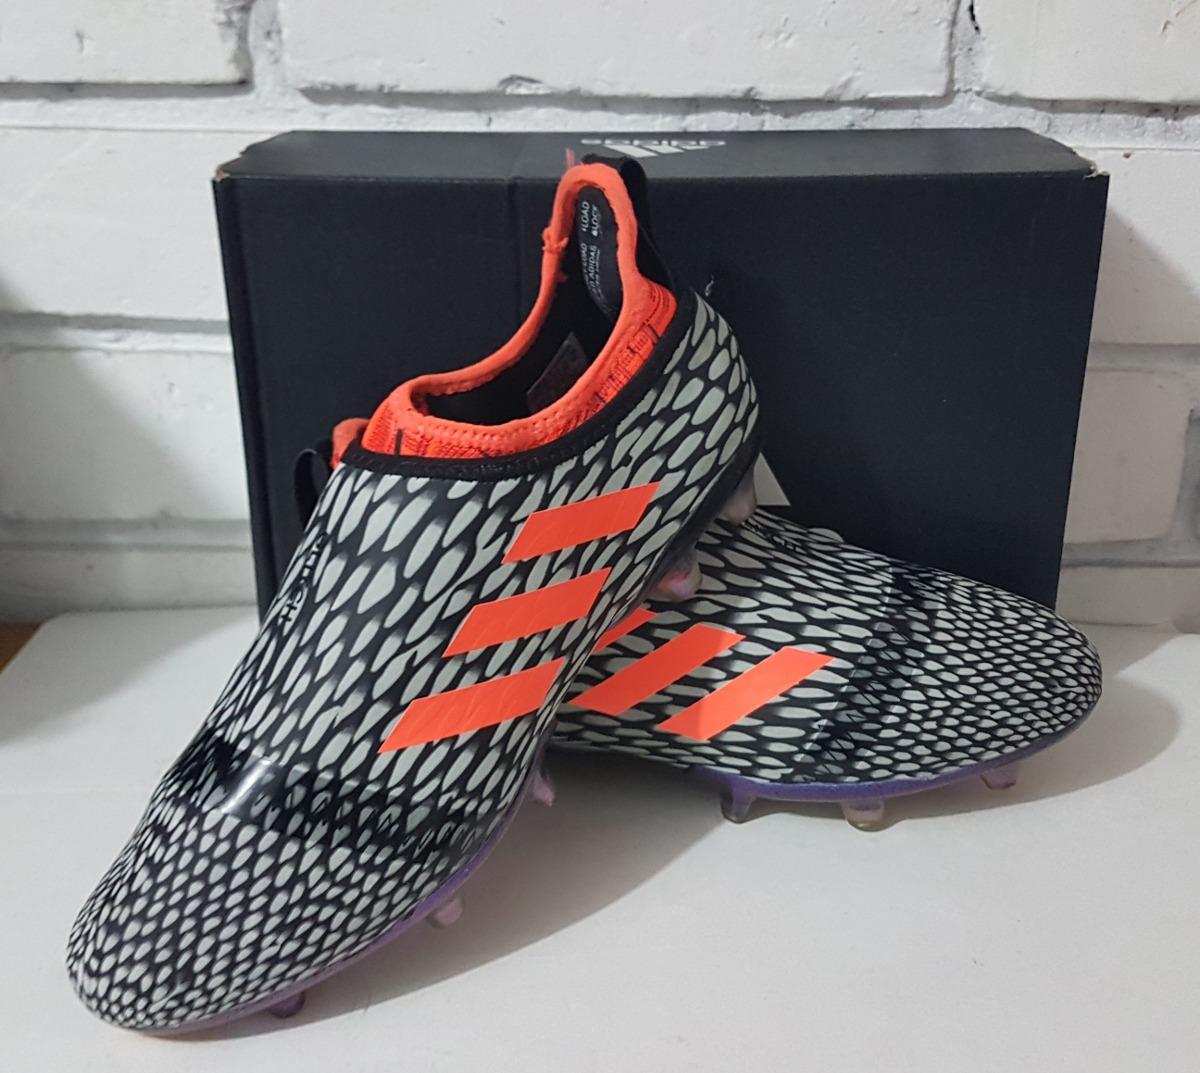 low cost b3aa6 8f573 guayos adidas glitch. Cargando zoom.